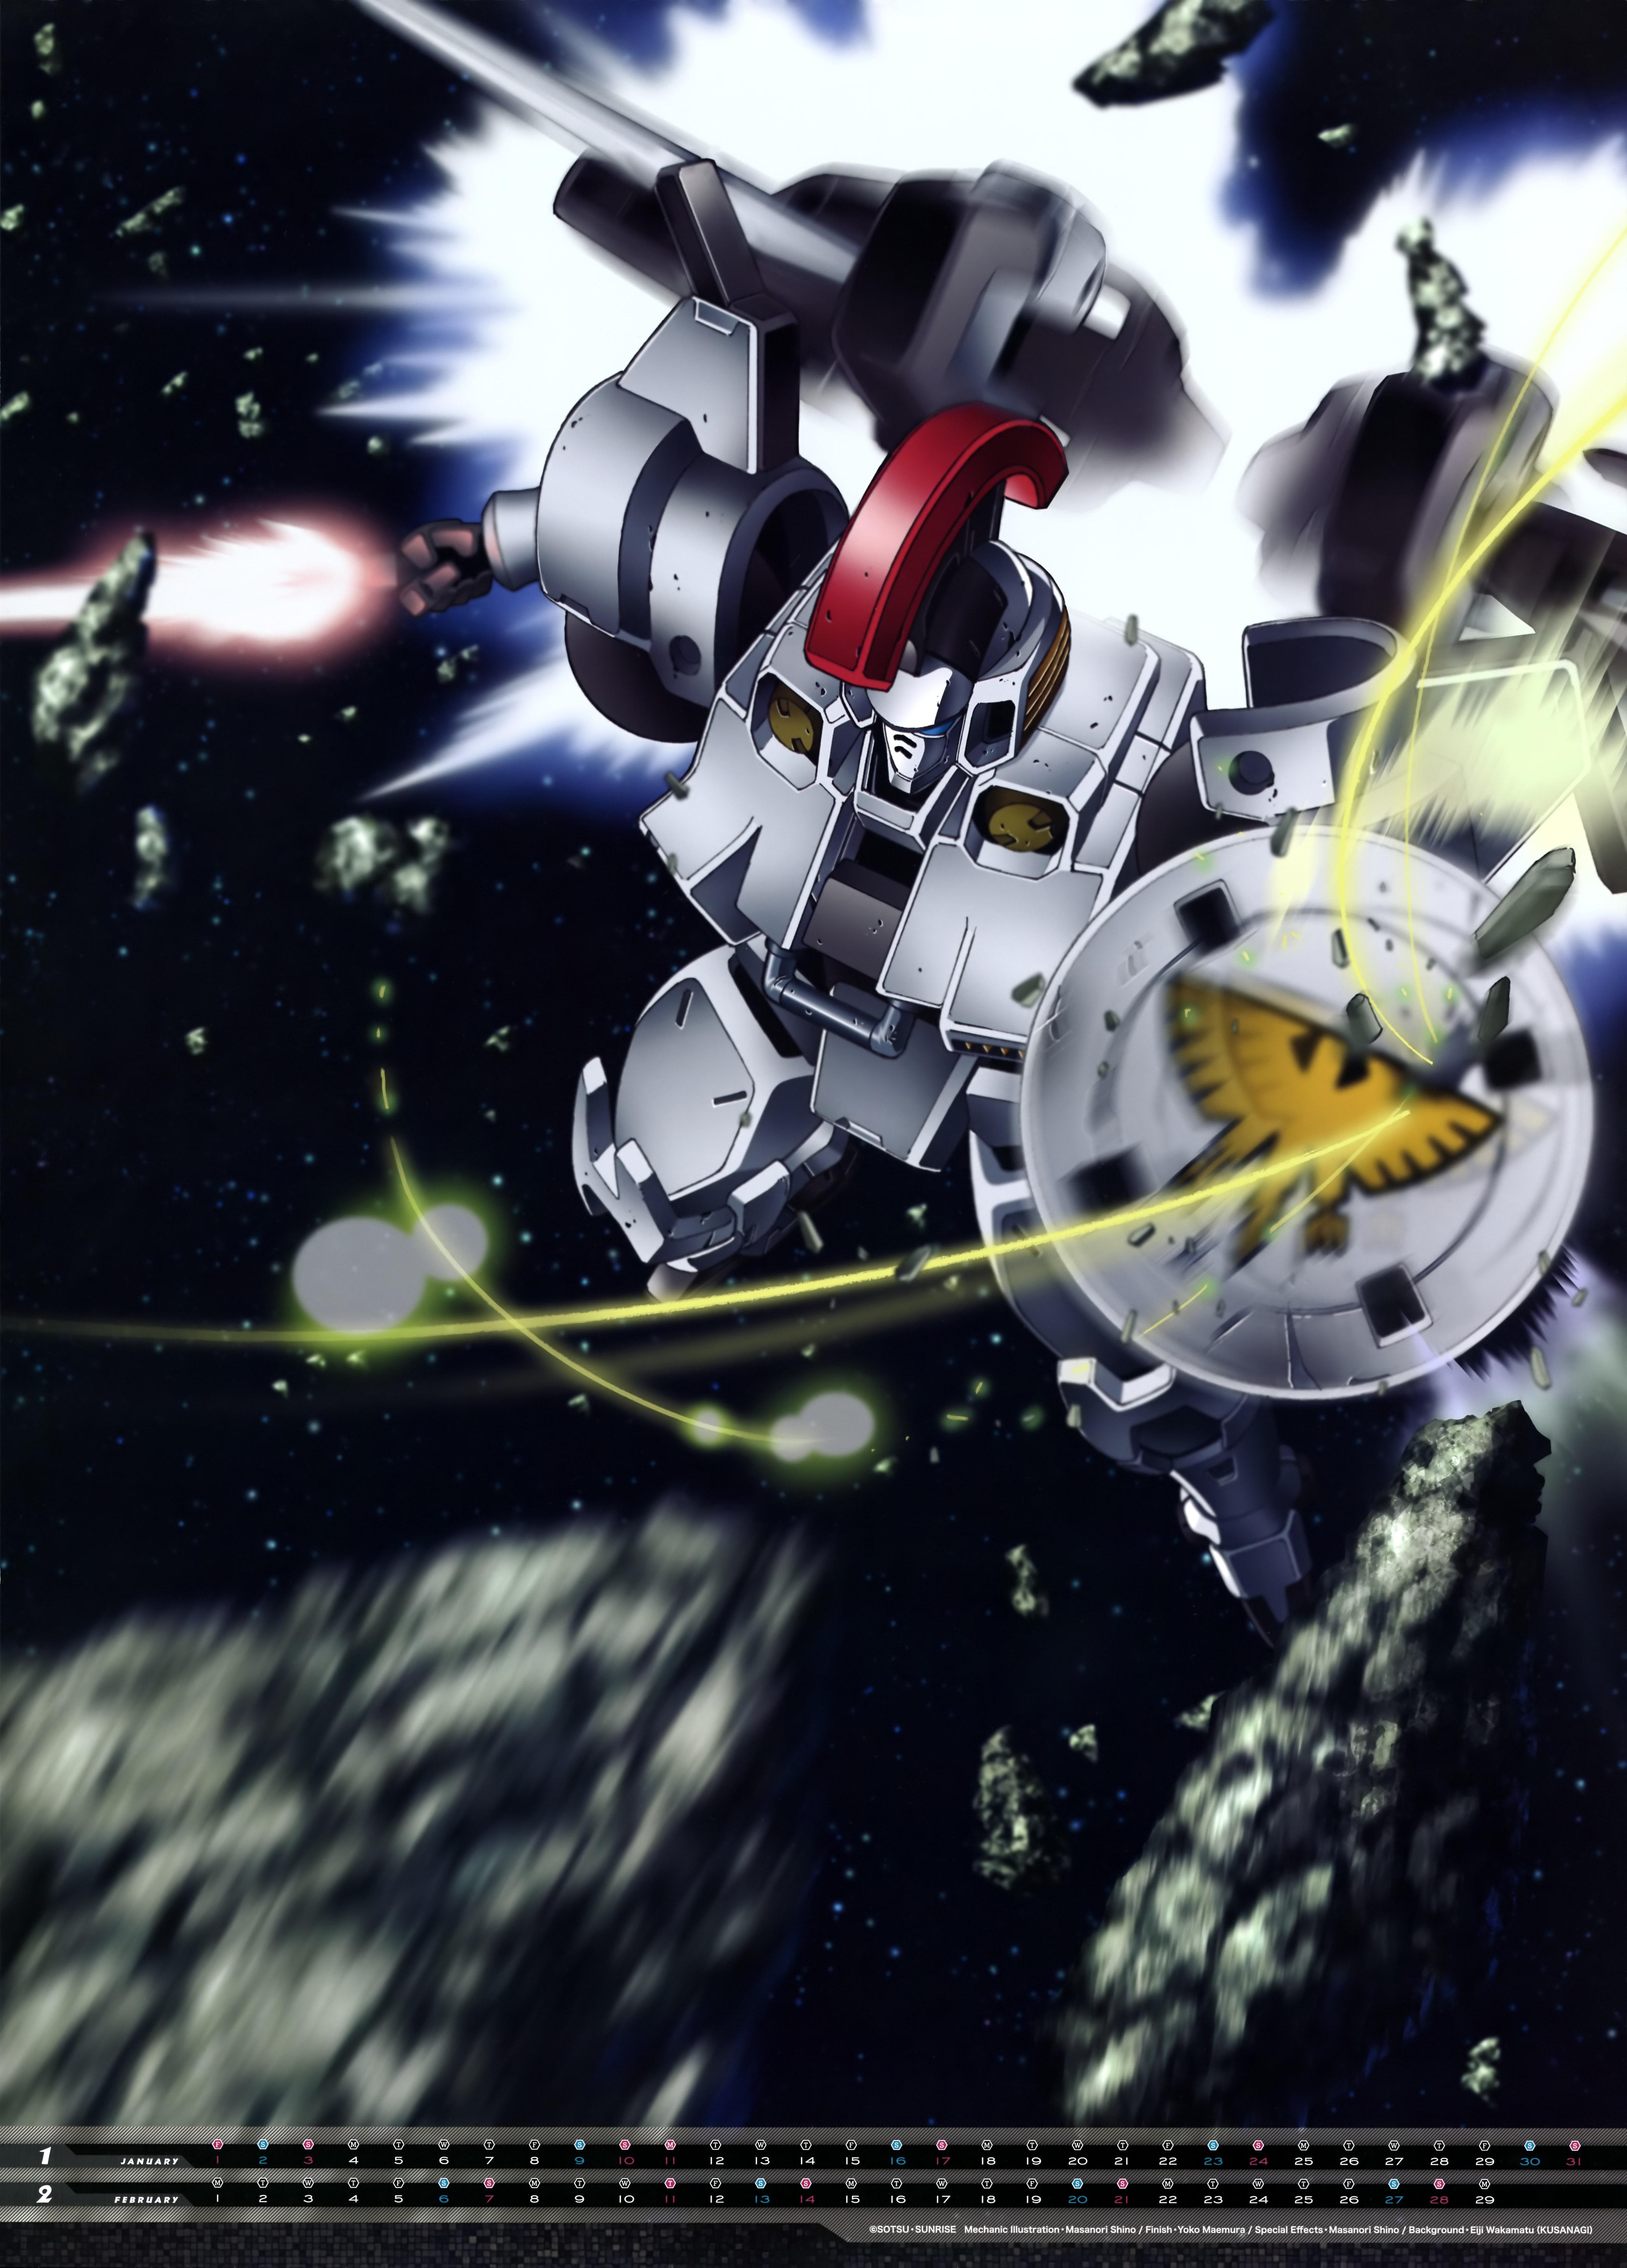 Mobile Suit Gundam Series anime Calendar 2016 0002